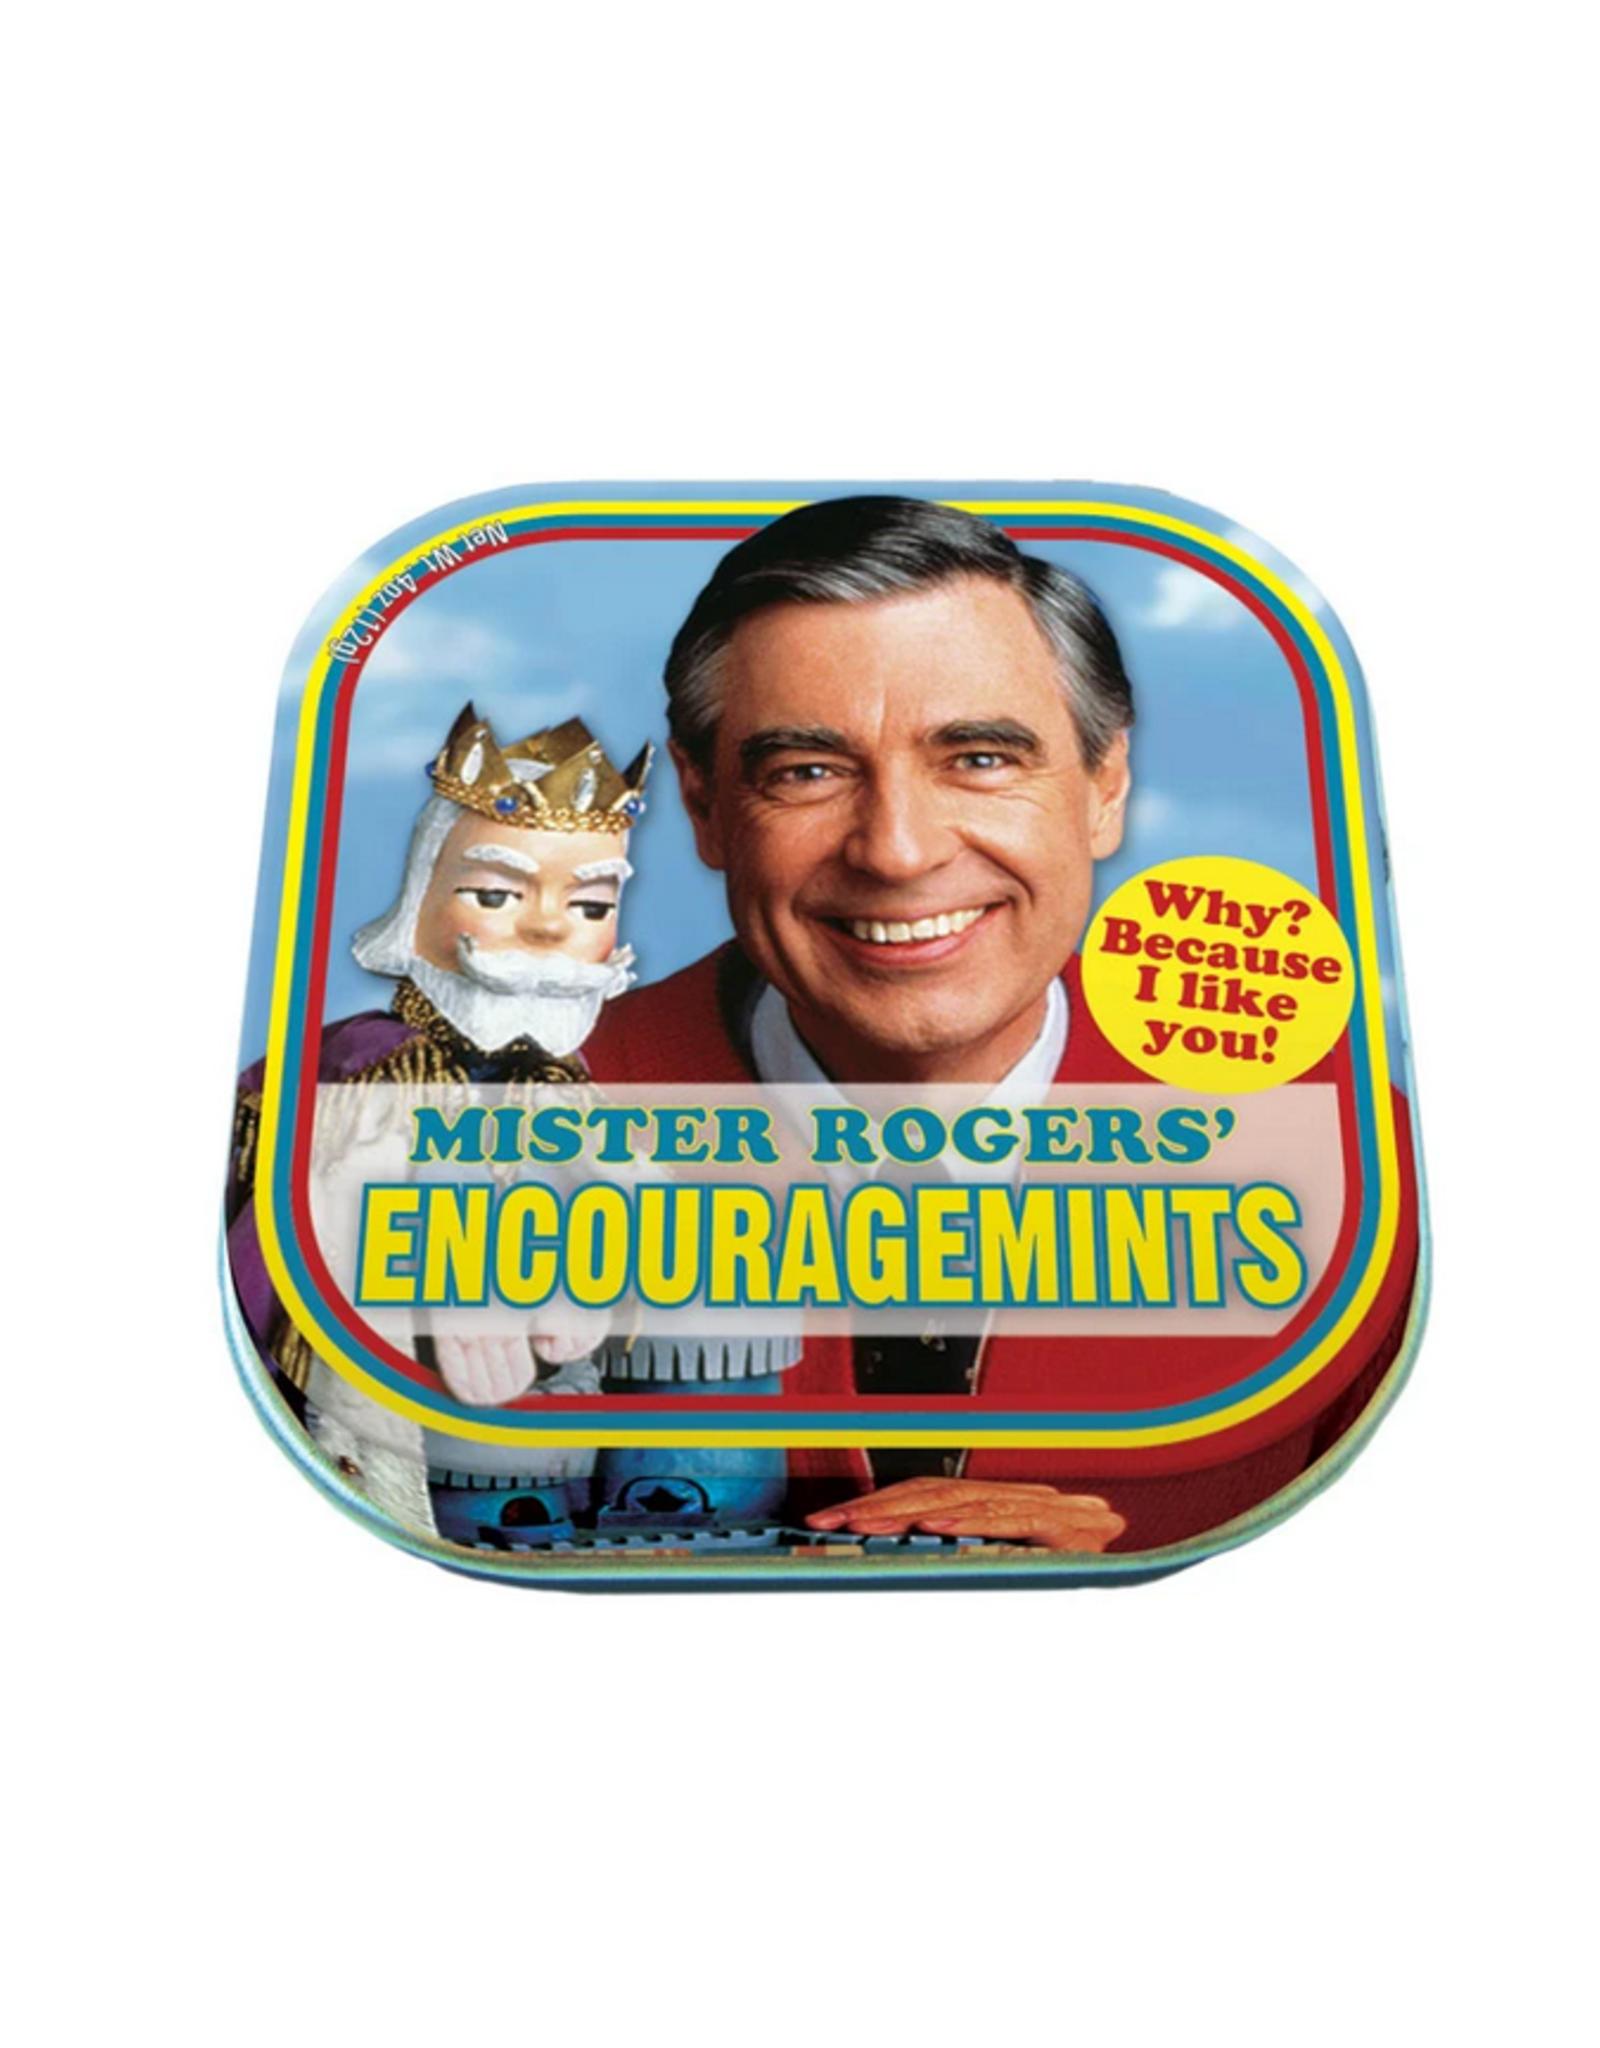 Encouragemints Mister Rogers